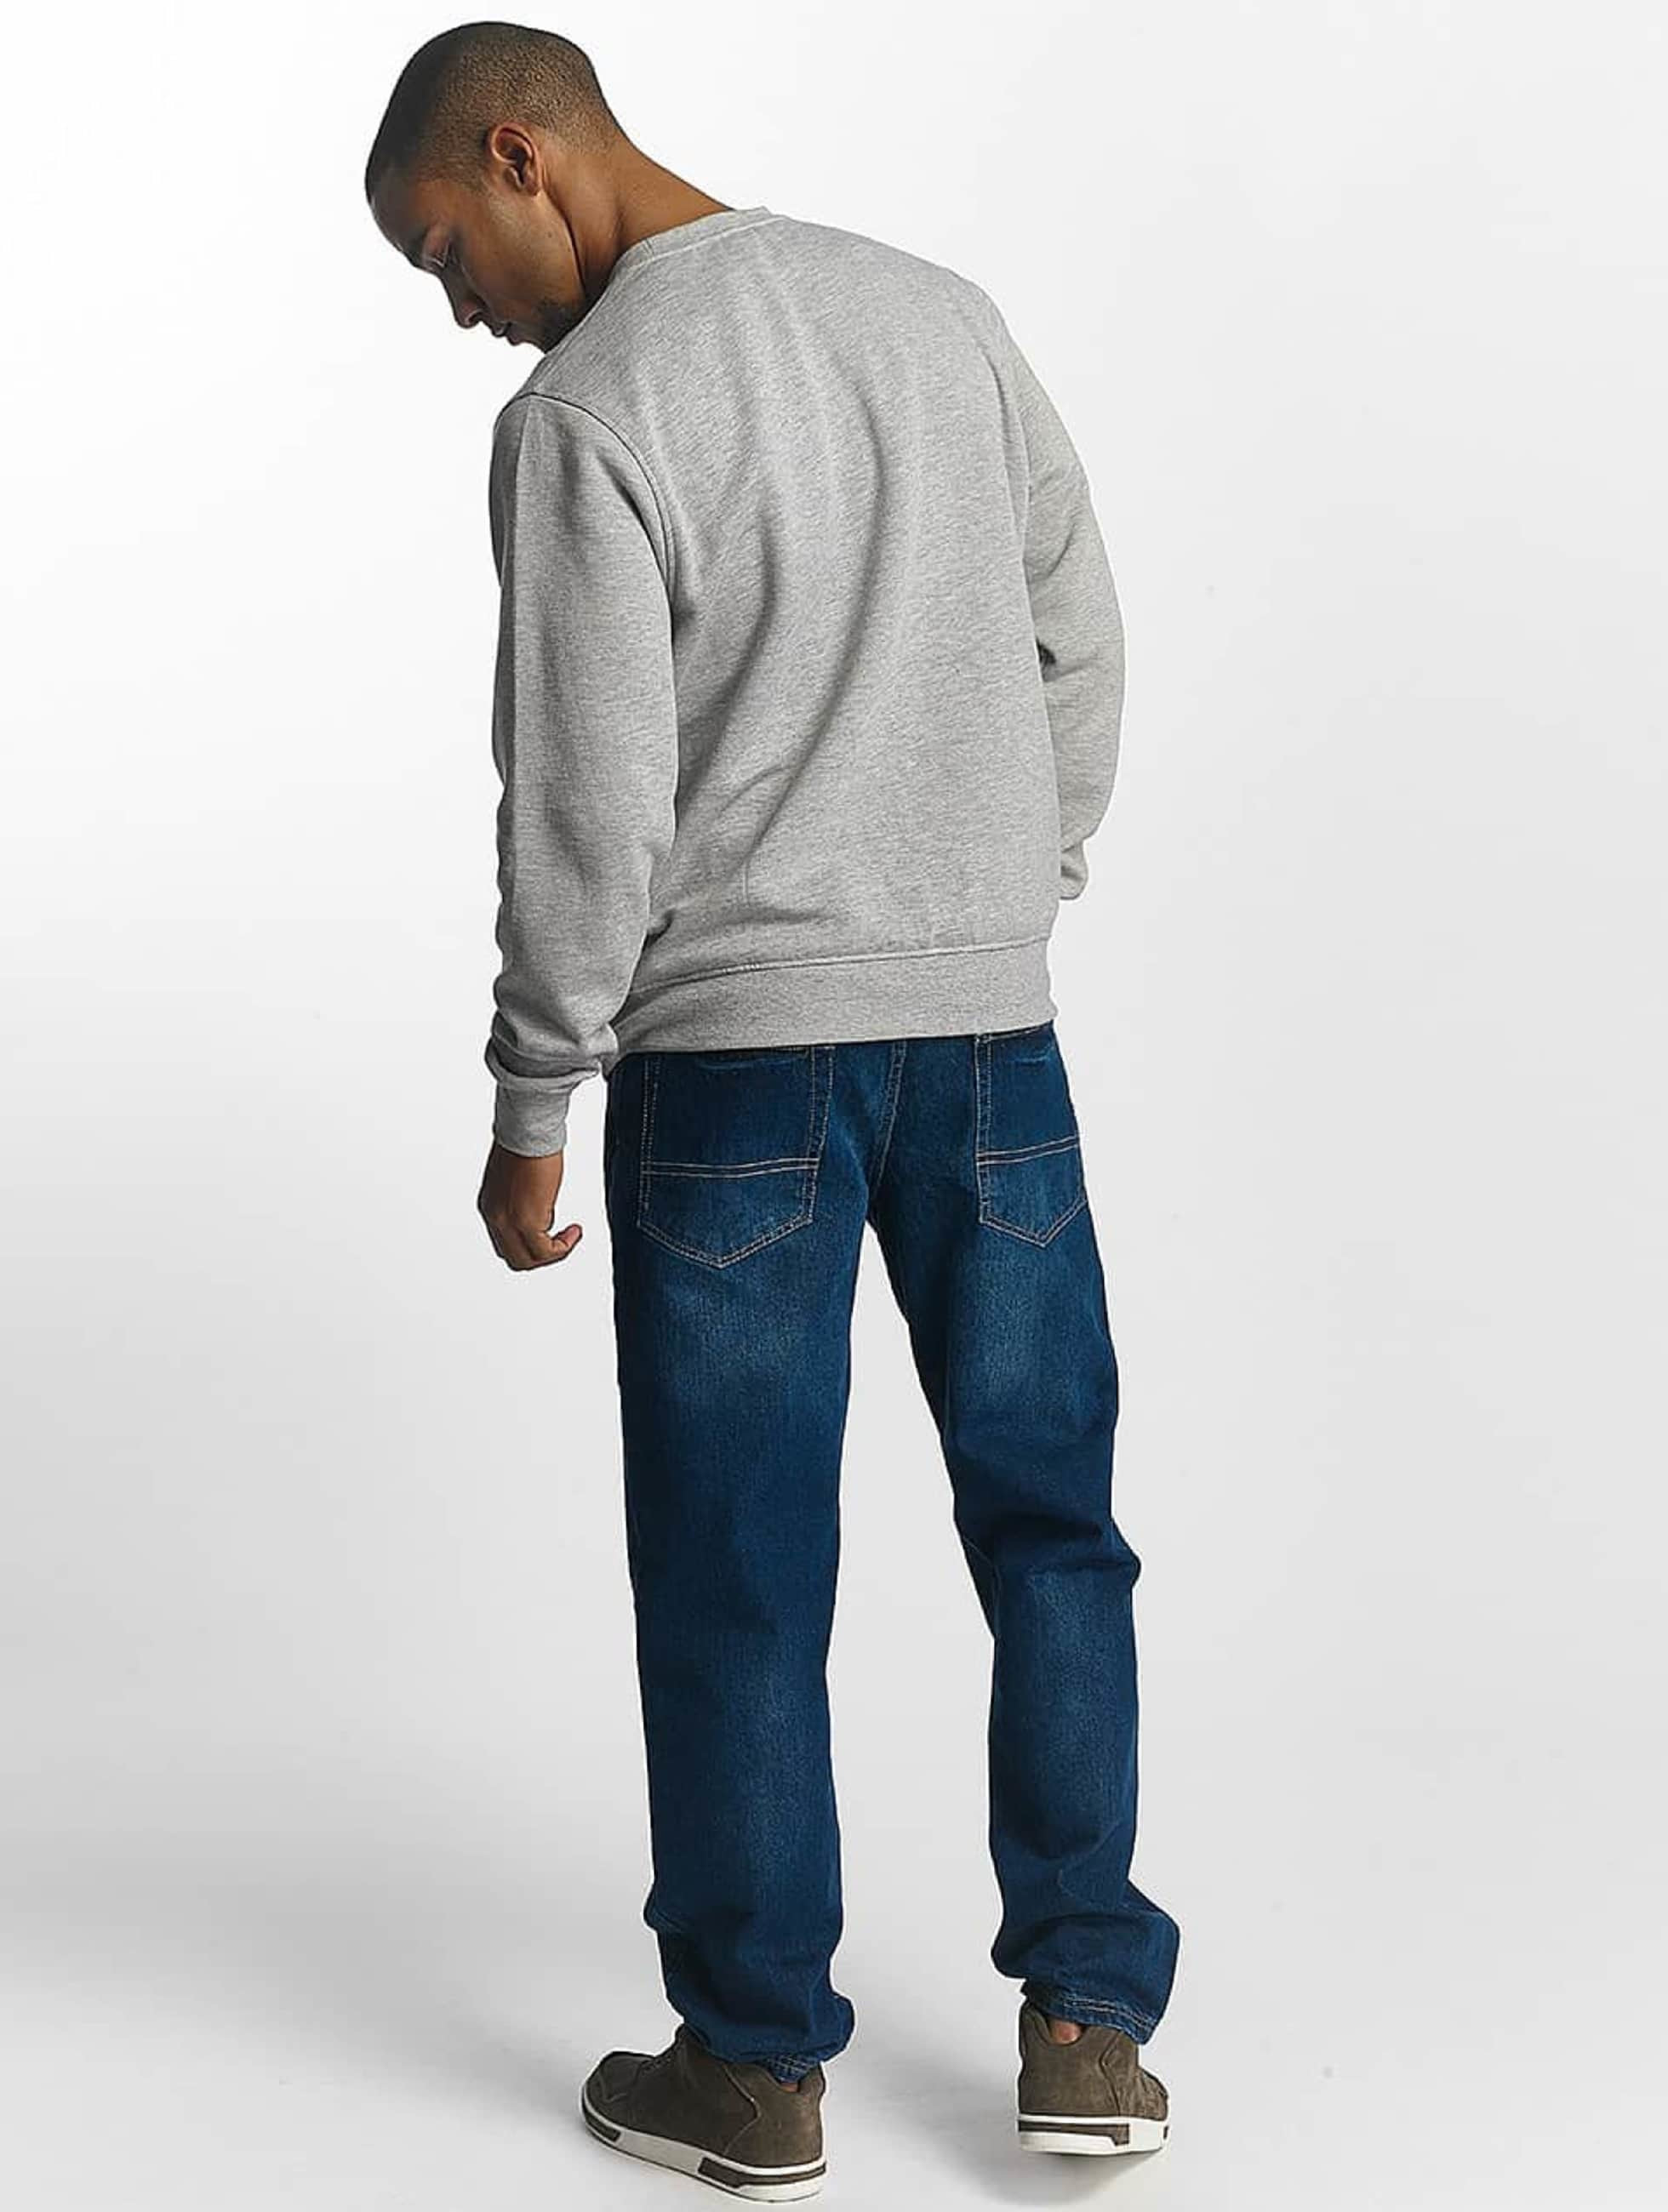 amstaff gecco bleu homme jean large coupe droite amstaff. Black Bedroom Furniture Sets. Home Design Ideas